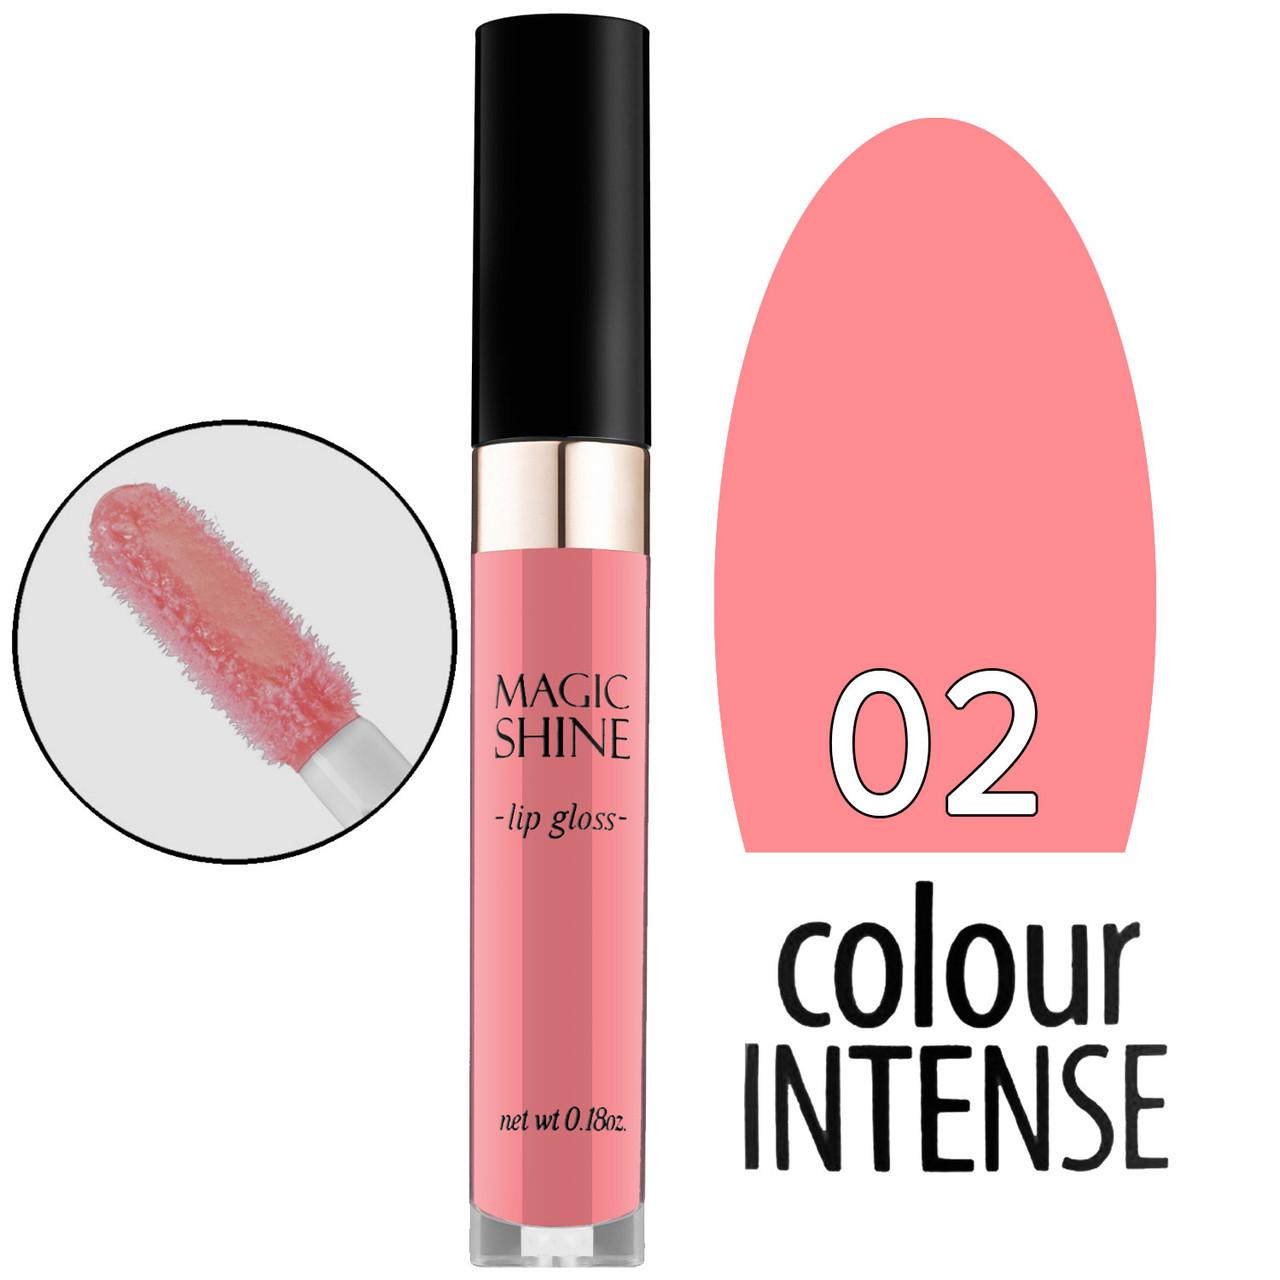 Colour Intense - Блеск для губ Magic Shine LG-103 Тон №02 light pink coral глянцевый